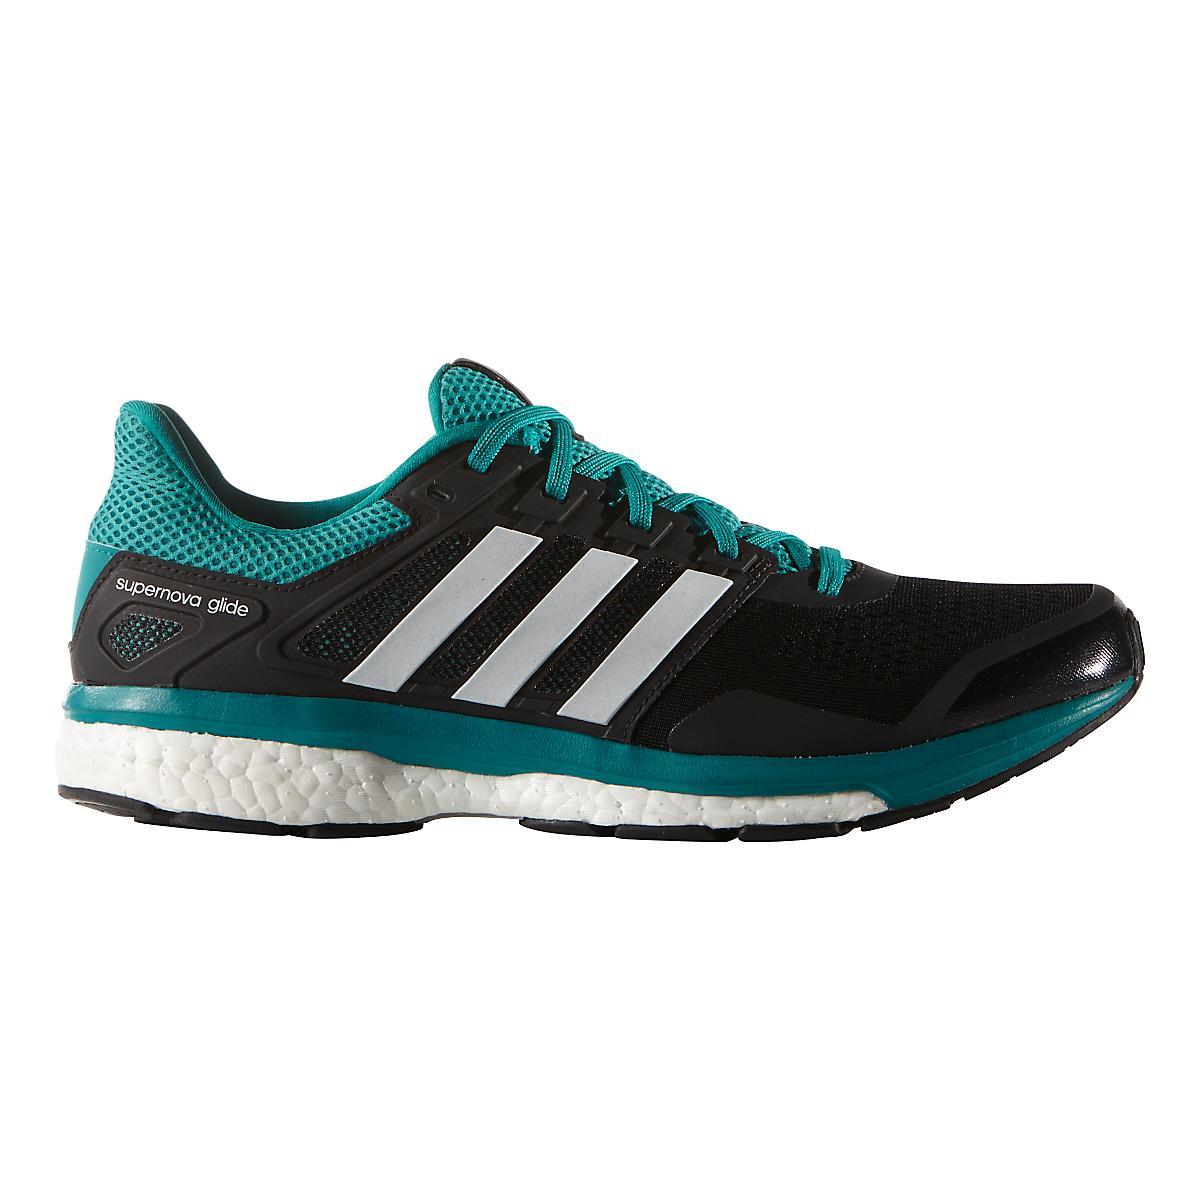 adidas supernova glide mens running shoes